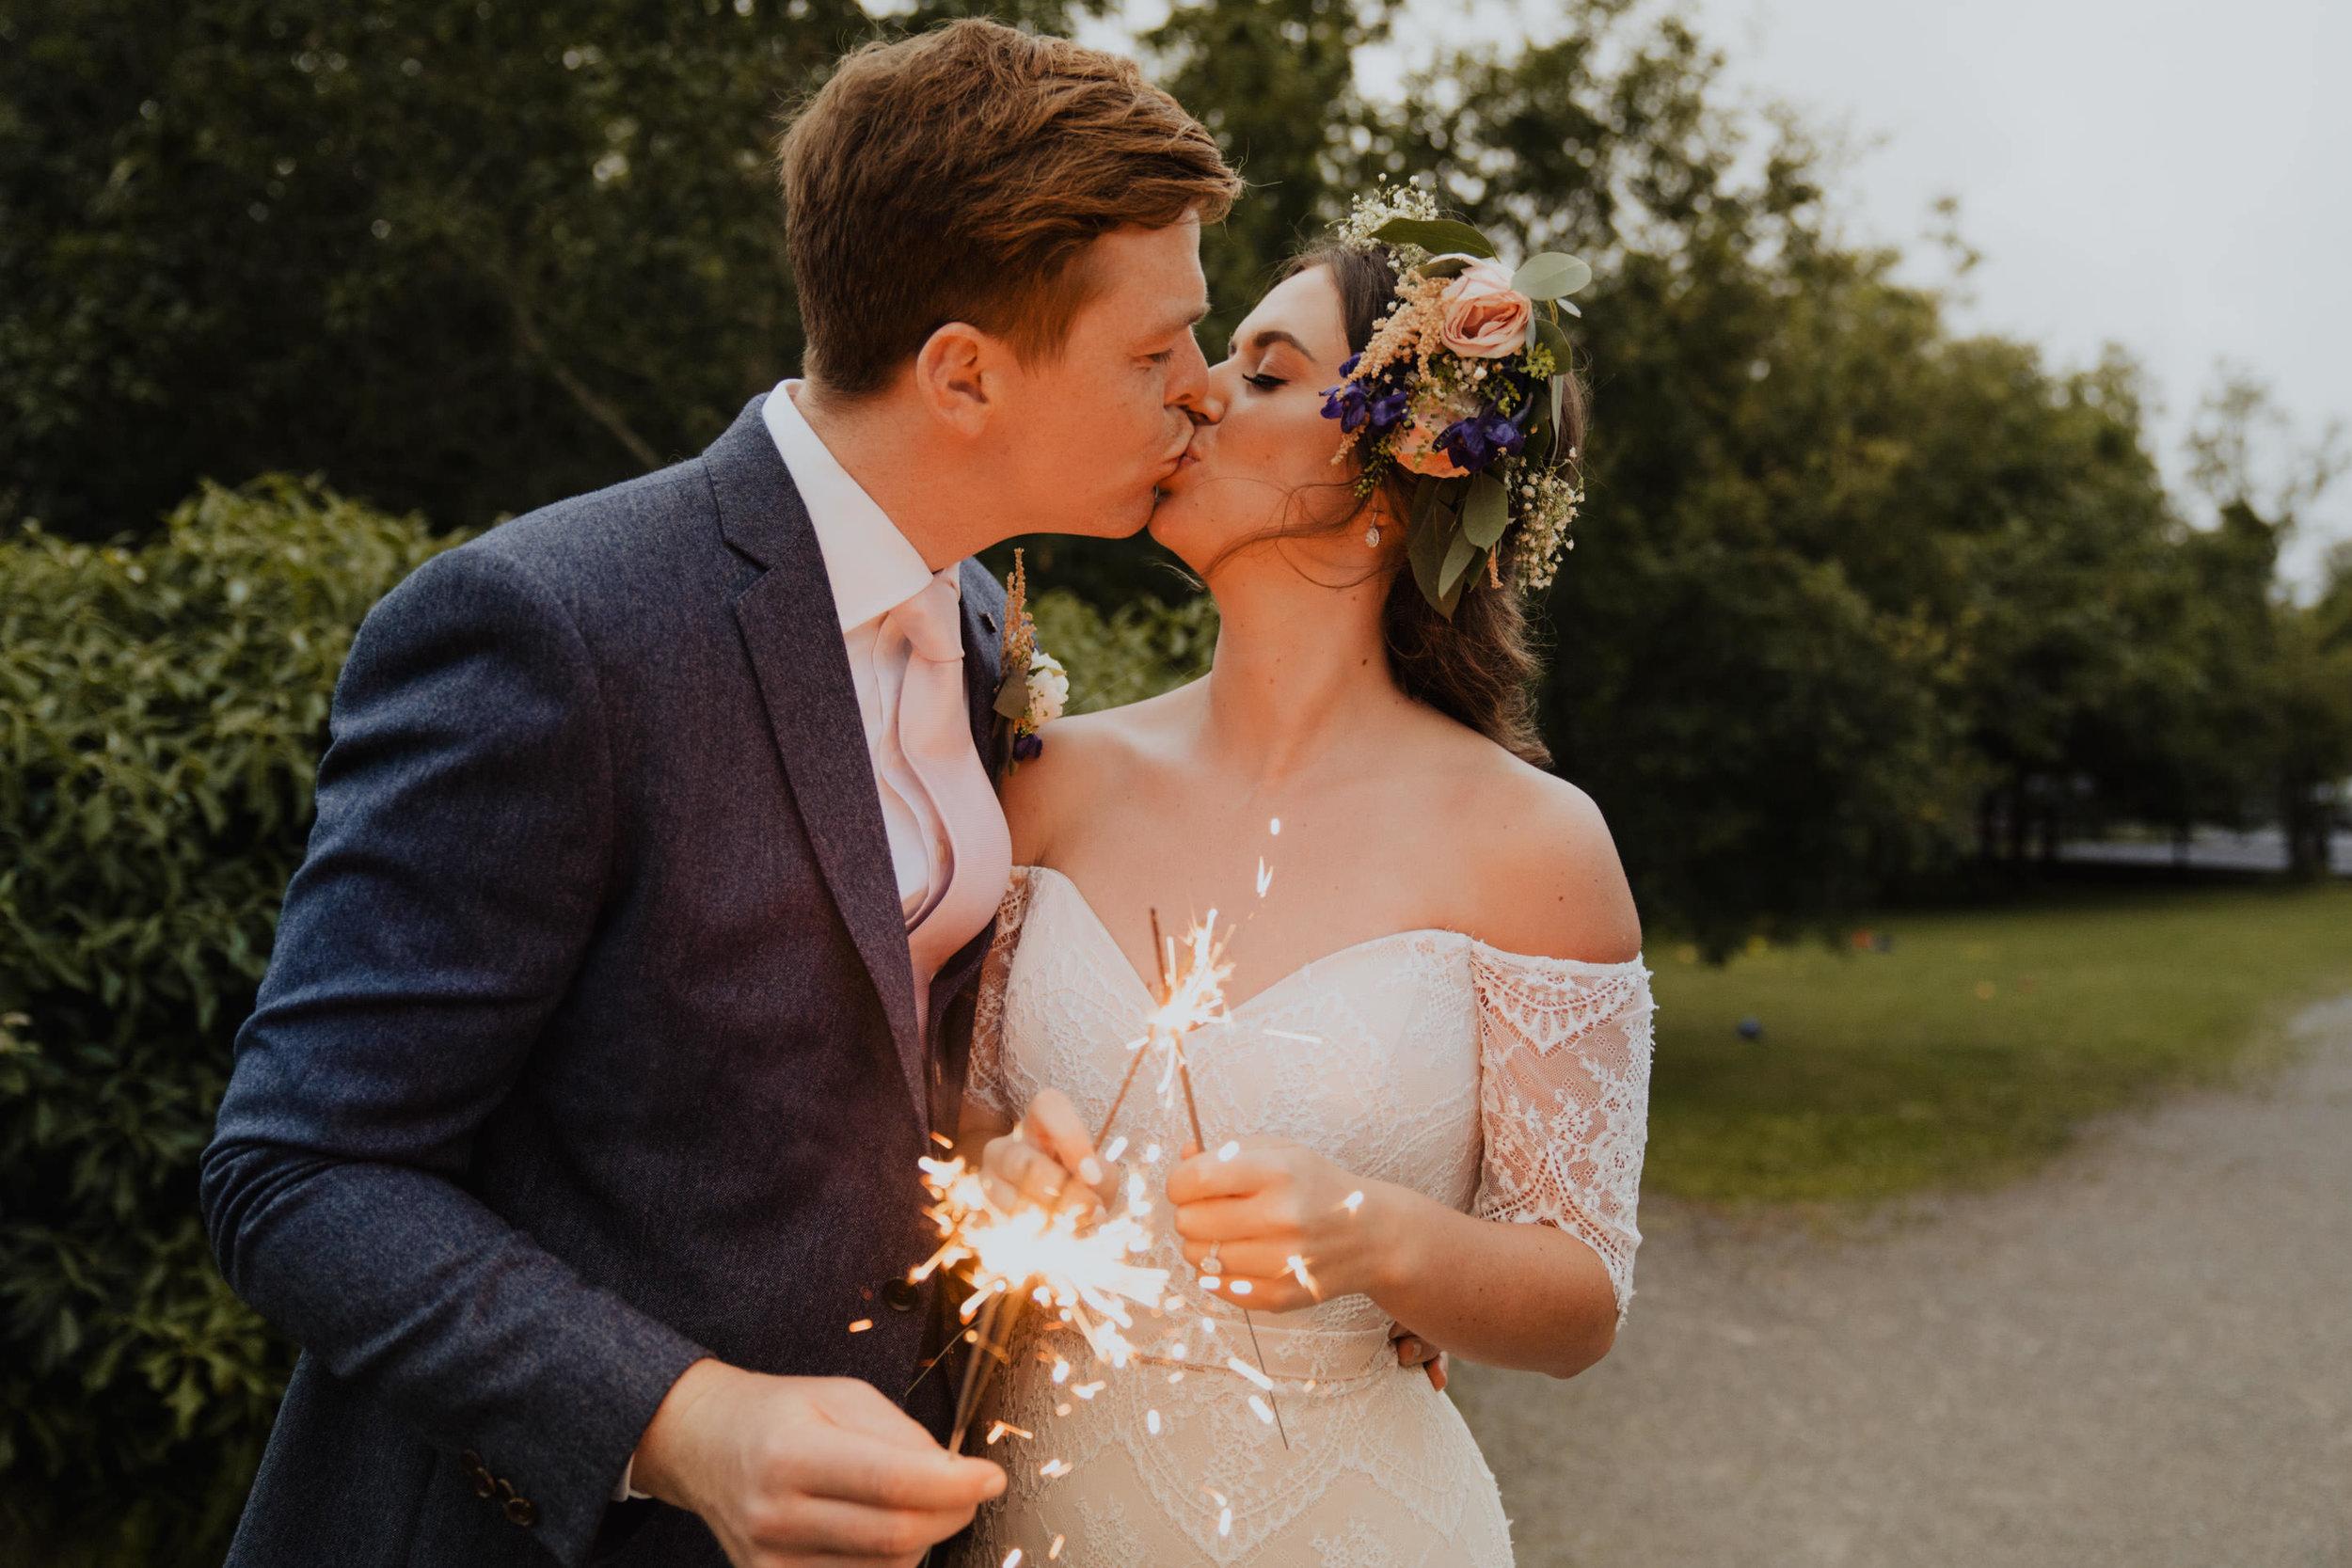 c&j_brigits_garden_galway_wedding_photographer_livia_figueiredo_43.jpg